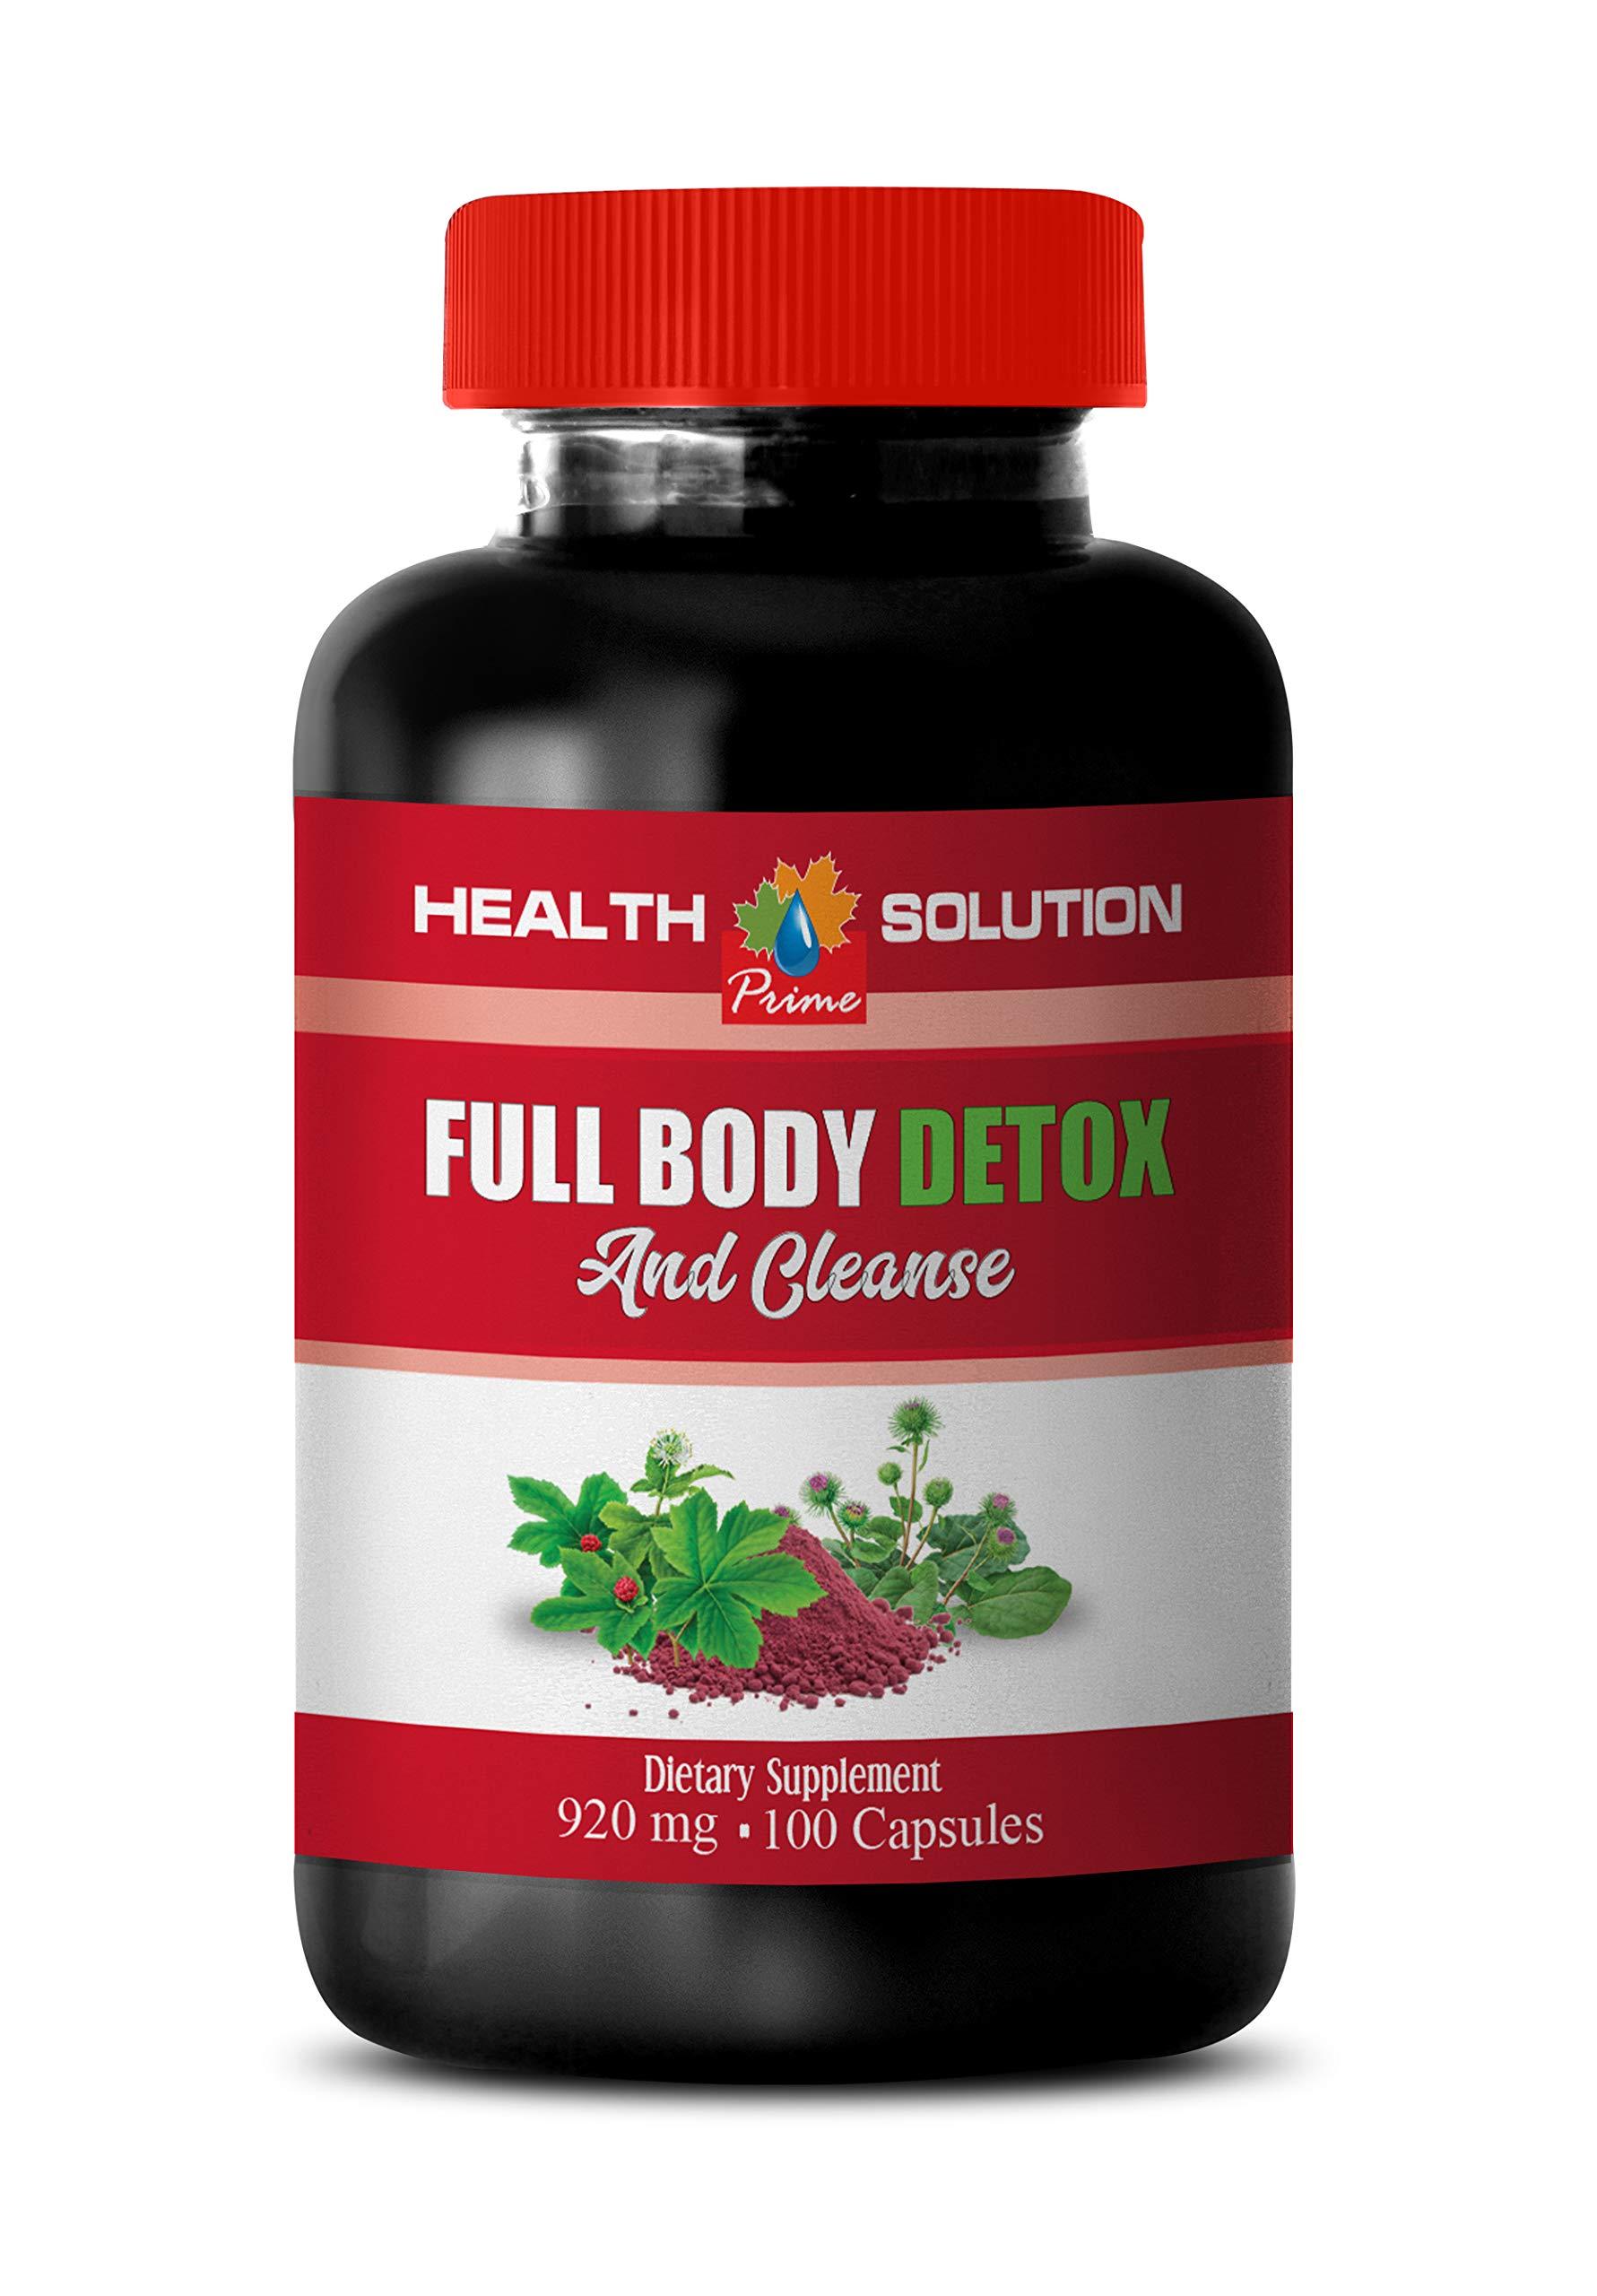 Men Detox Cleanser - Full Body Detox and Cleanse 920 MG - Milk Thistle and Burdock - 1 Bottle 100 Capsules